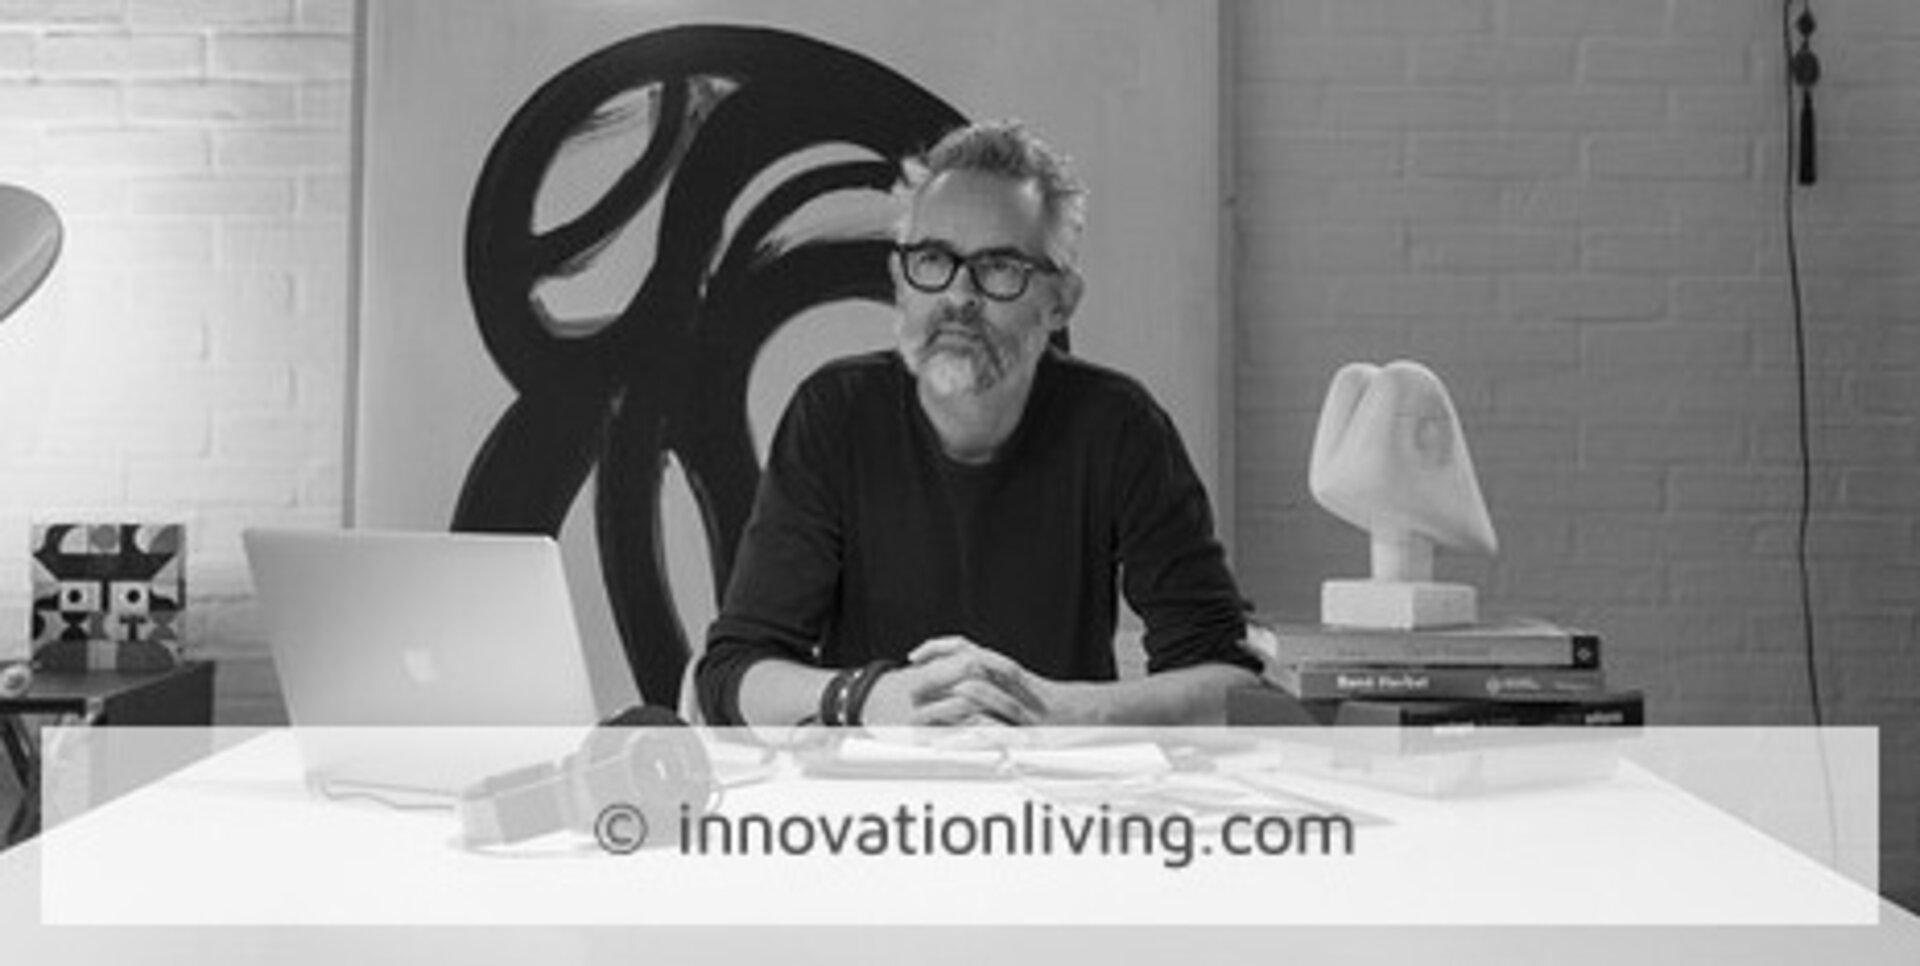 Designer Per Weiss